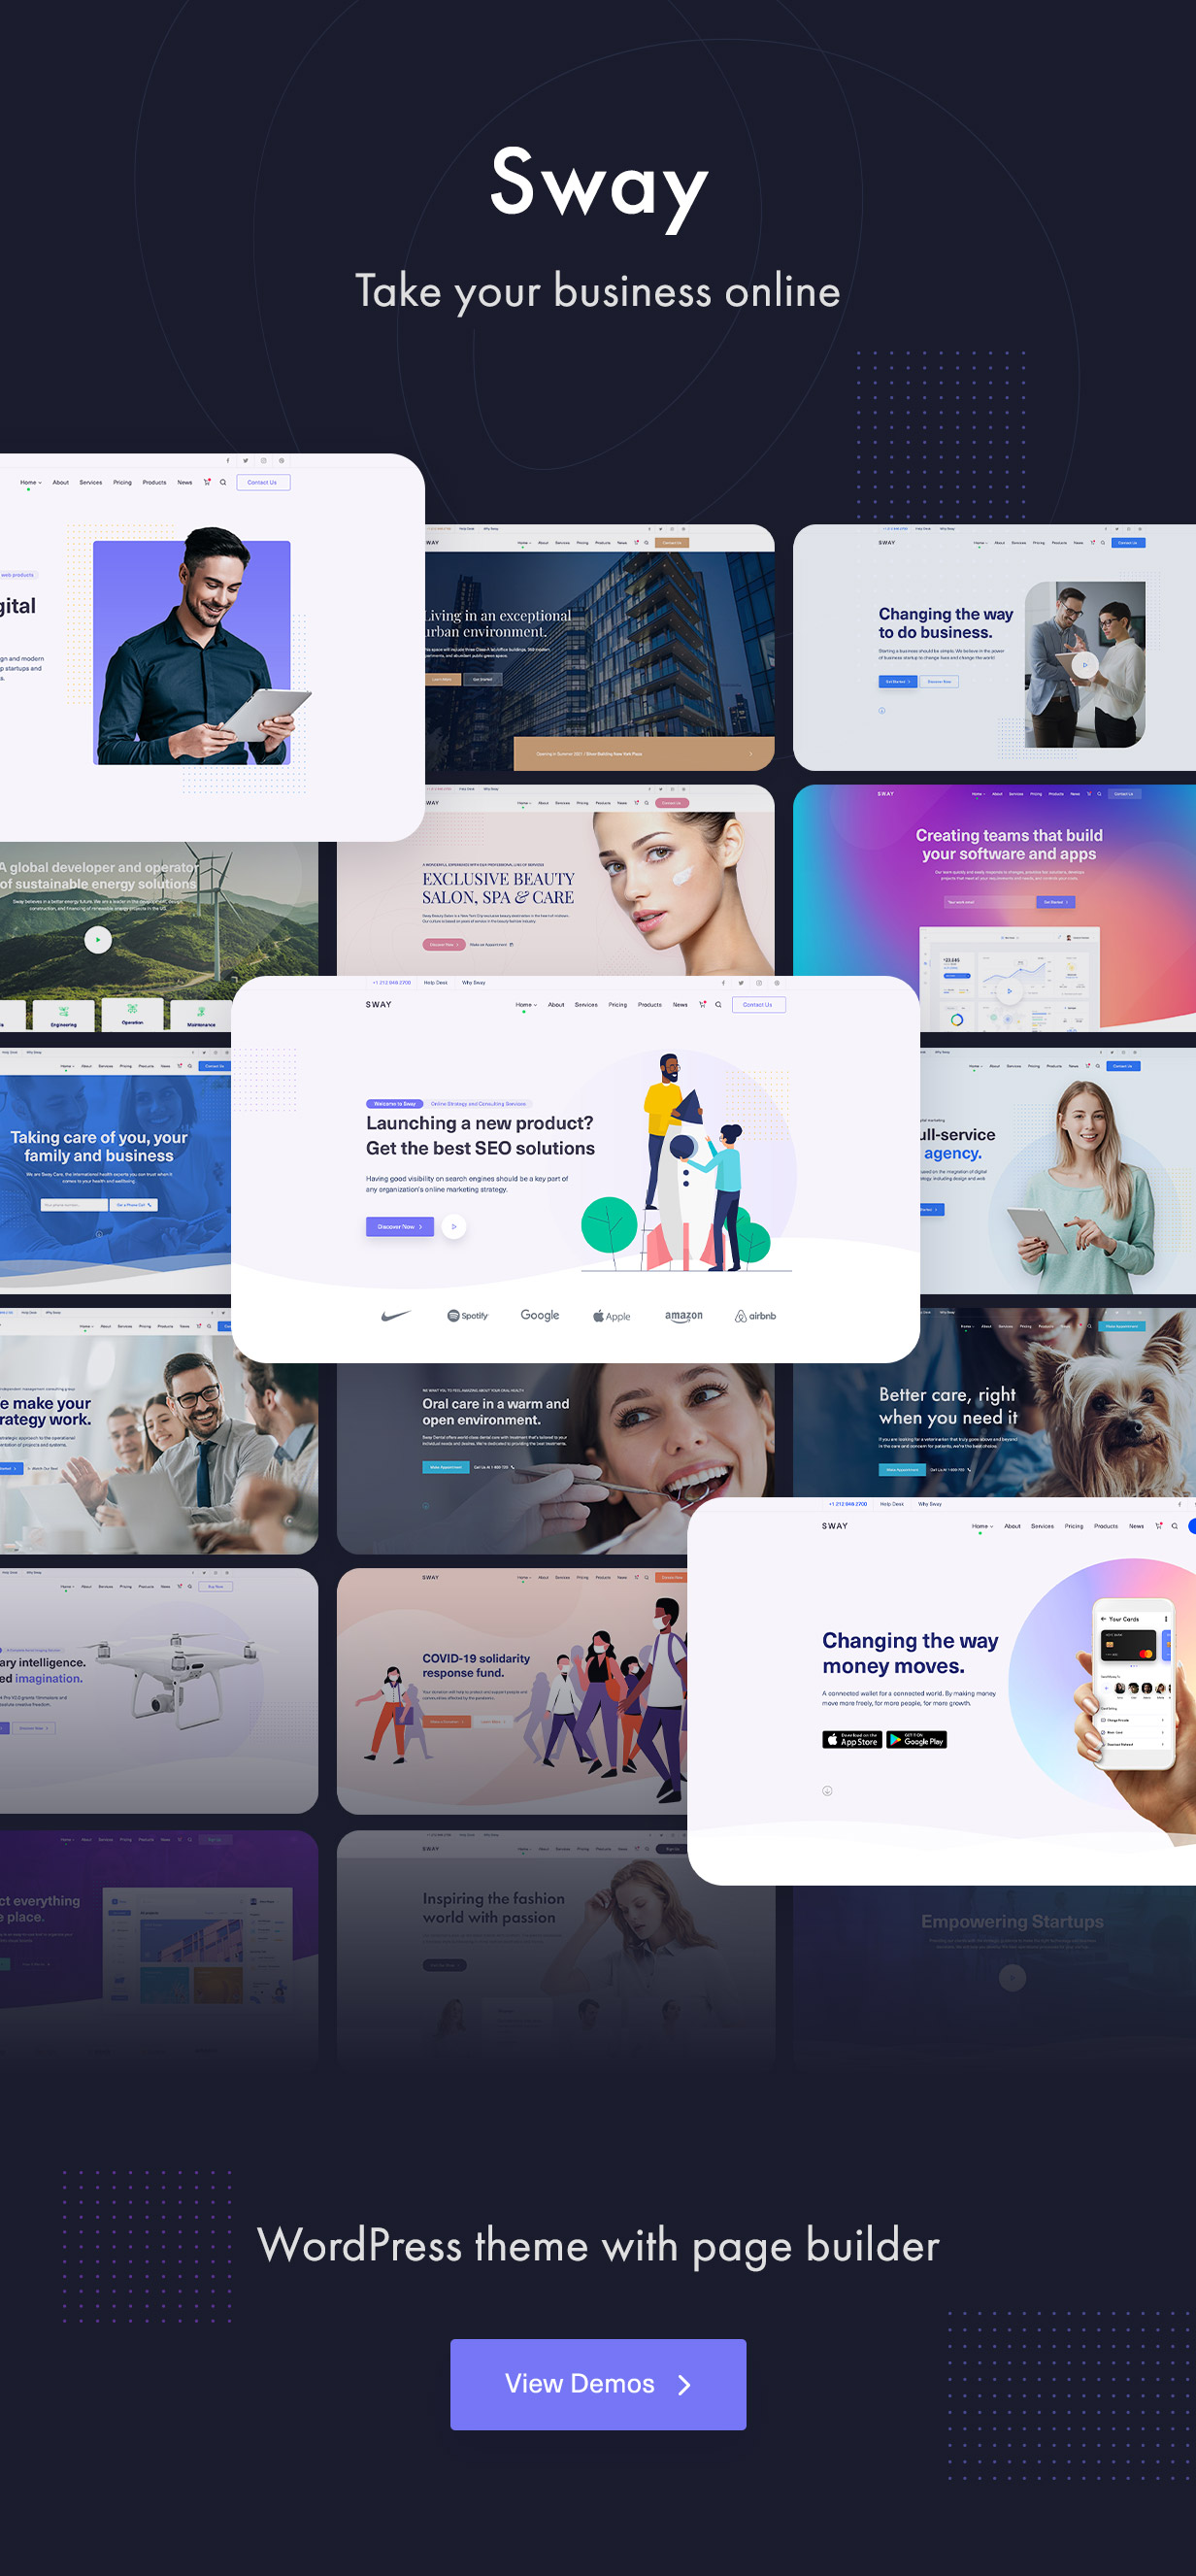 Sway - Multi-Purpose WordPress Theme with Page Builder - 6